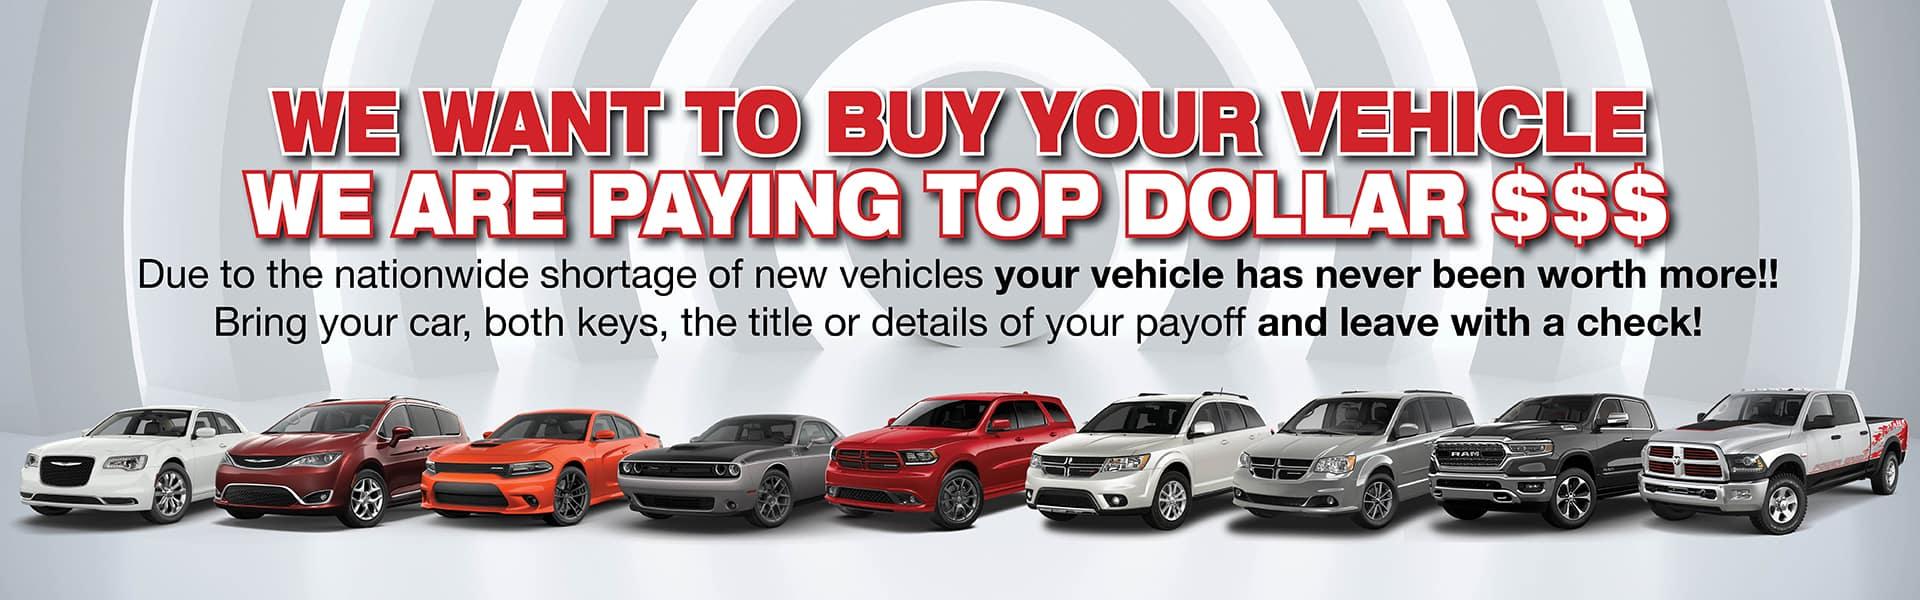 091.532.01_Schlossmann's Dodge City_1920x600_Buy Your Vehicle_Dealer Web